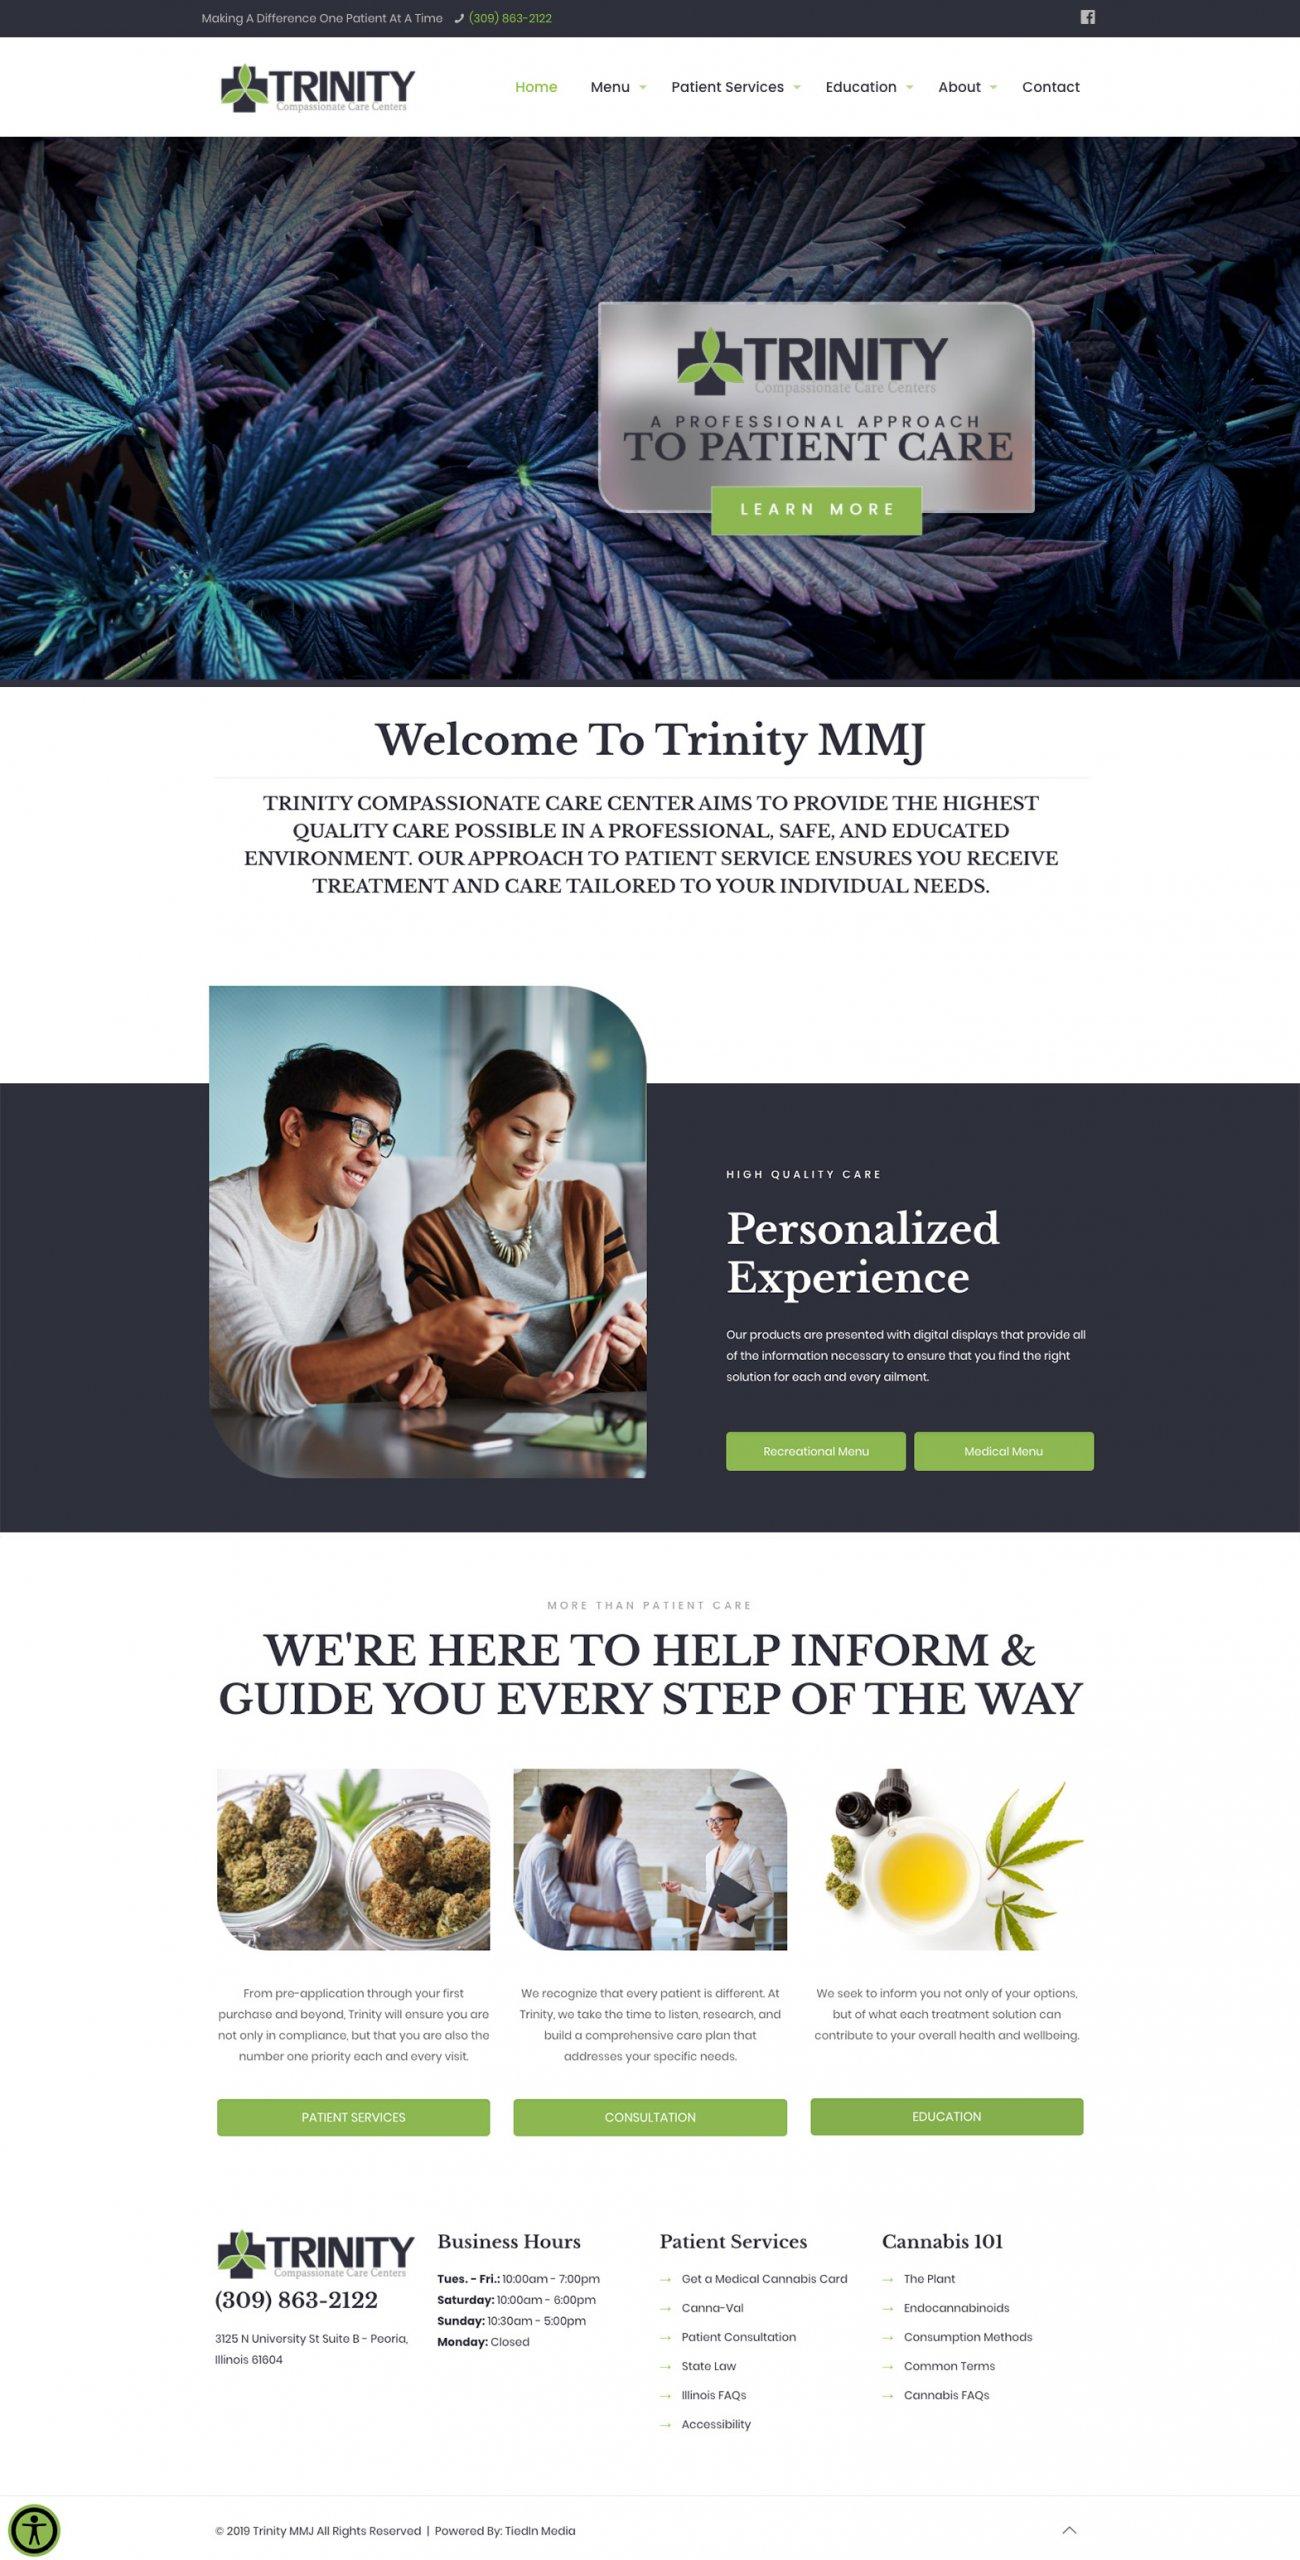 trinity-mmj-website-design-homepage